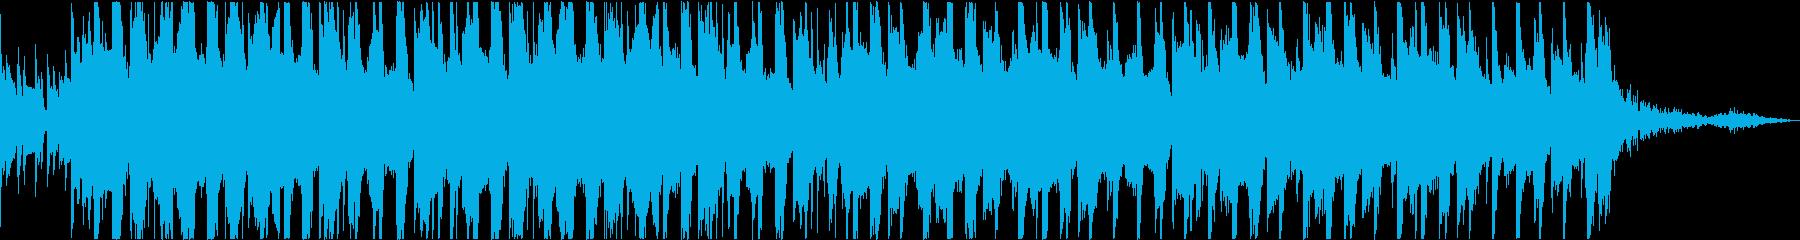 HIPHOP EDM トロピカル 哀愁の再生済みの波形